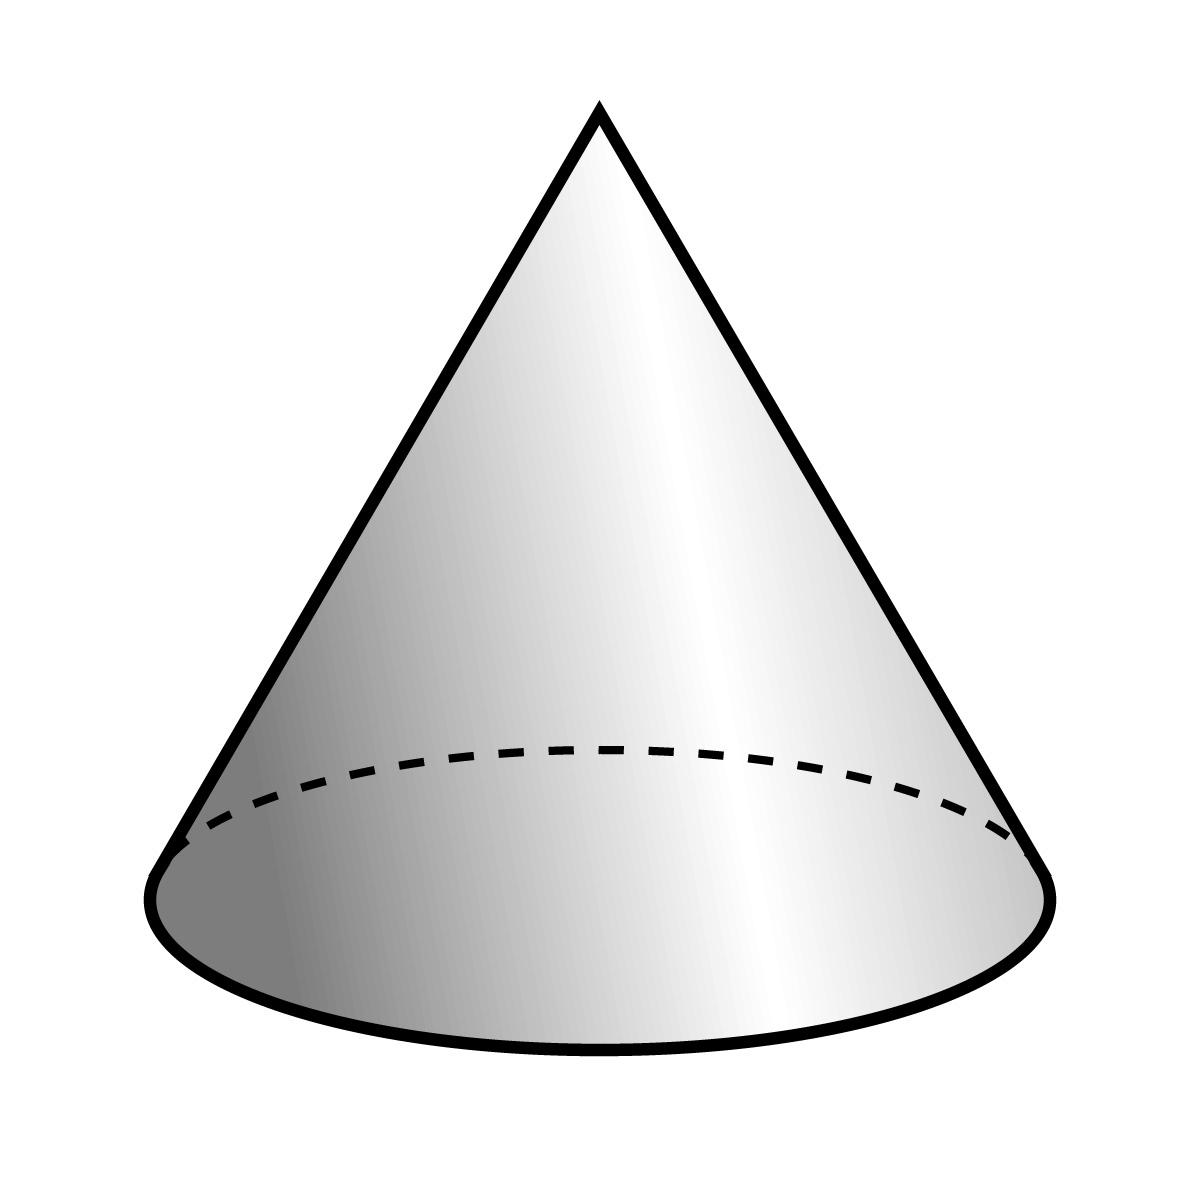 1200x1200 Geometric Shapes Clip Art Black And White thewealthbuilding